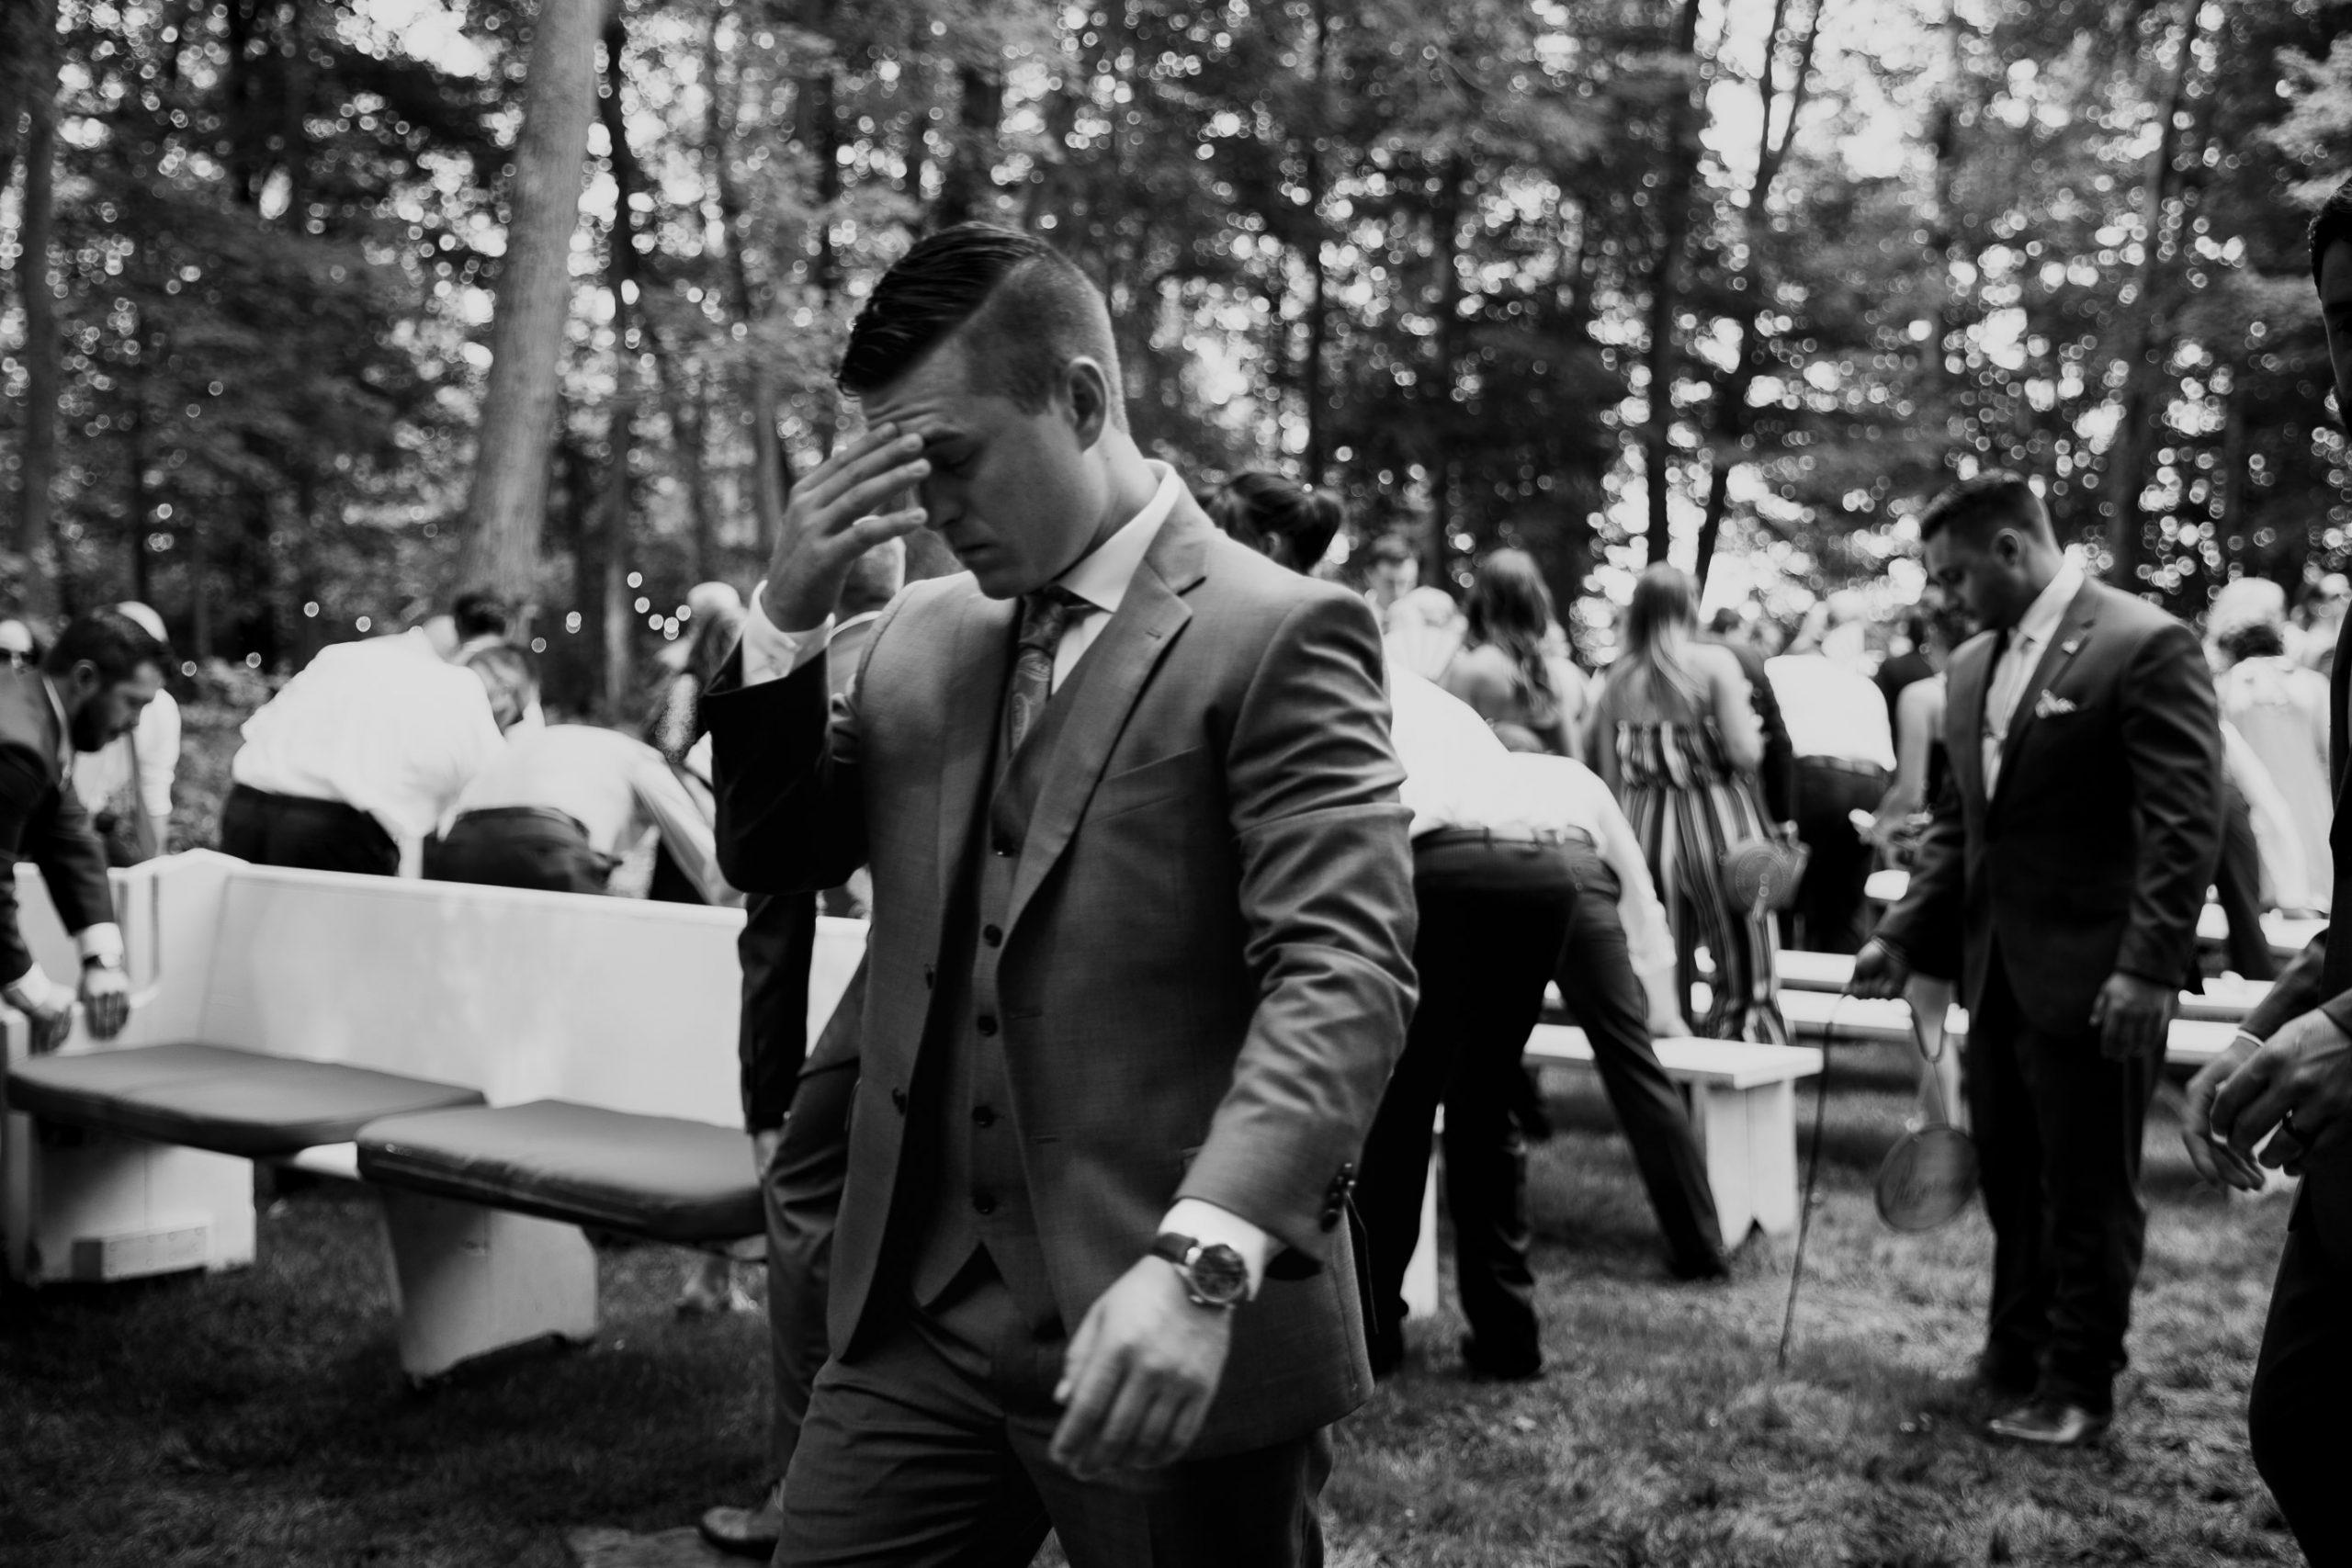 Wedding photo ceremony groom stressed from muddy ground outdoor